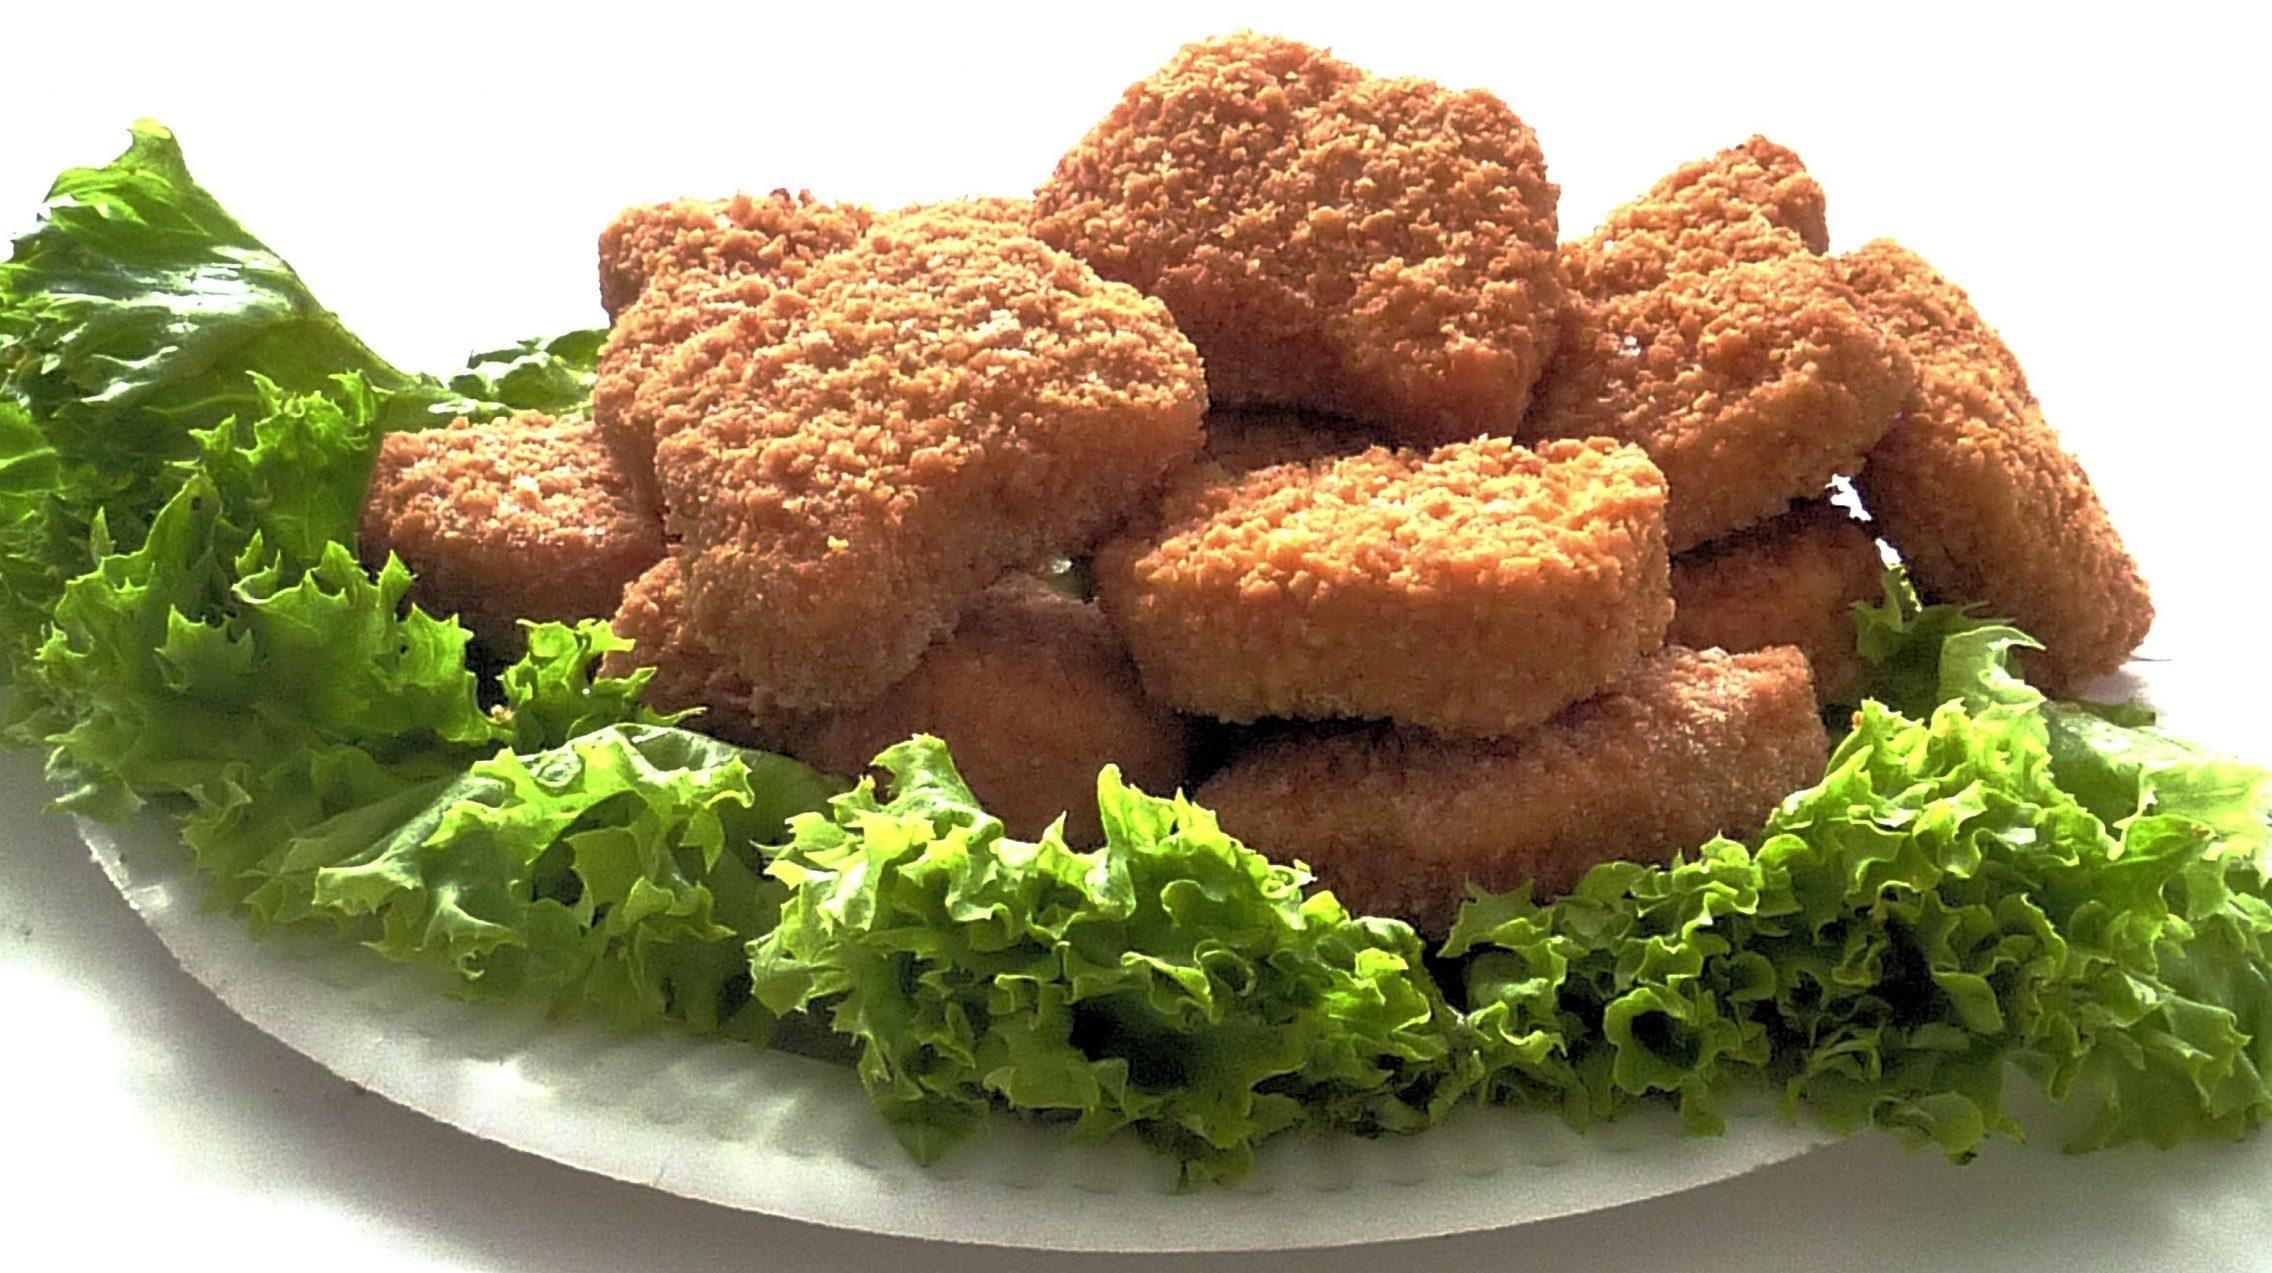 galden nuggets